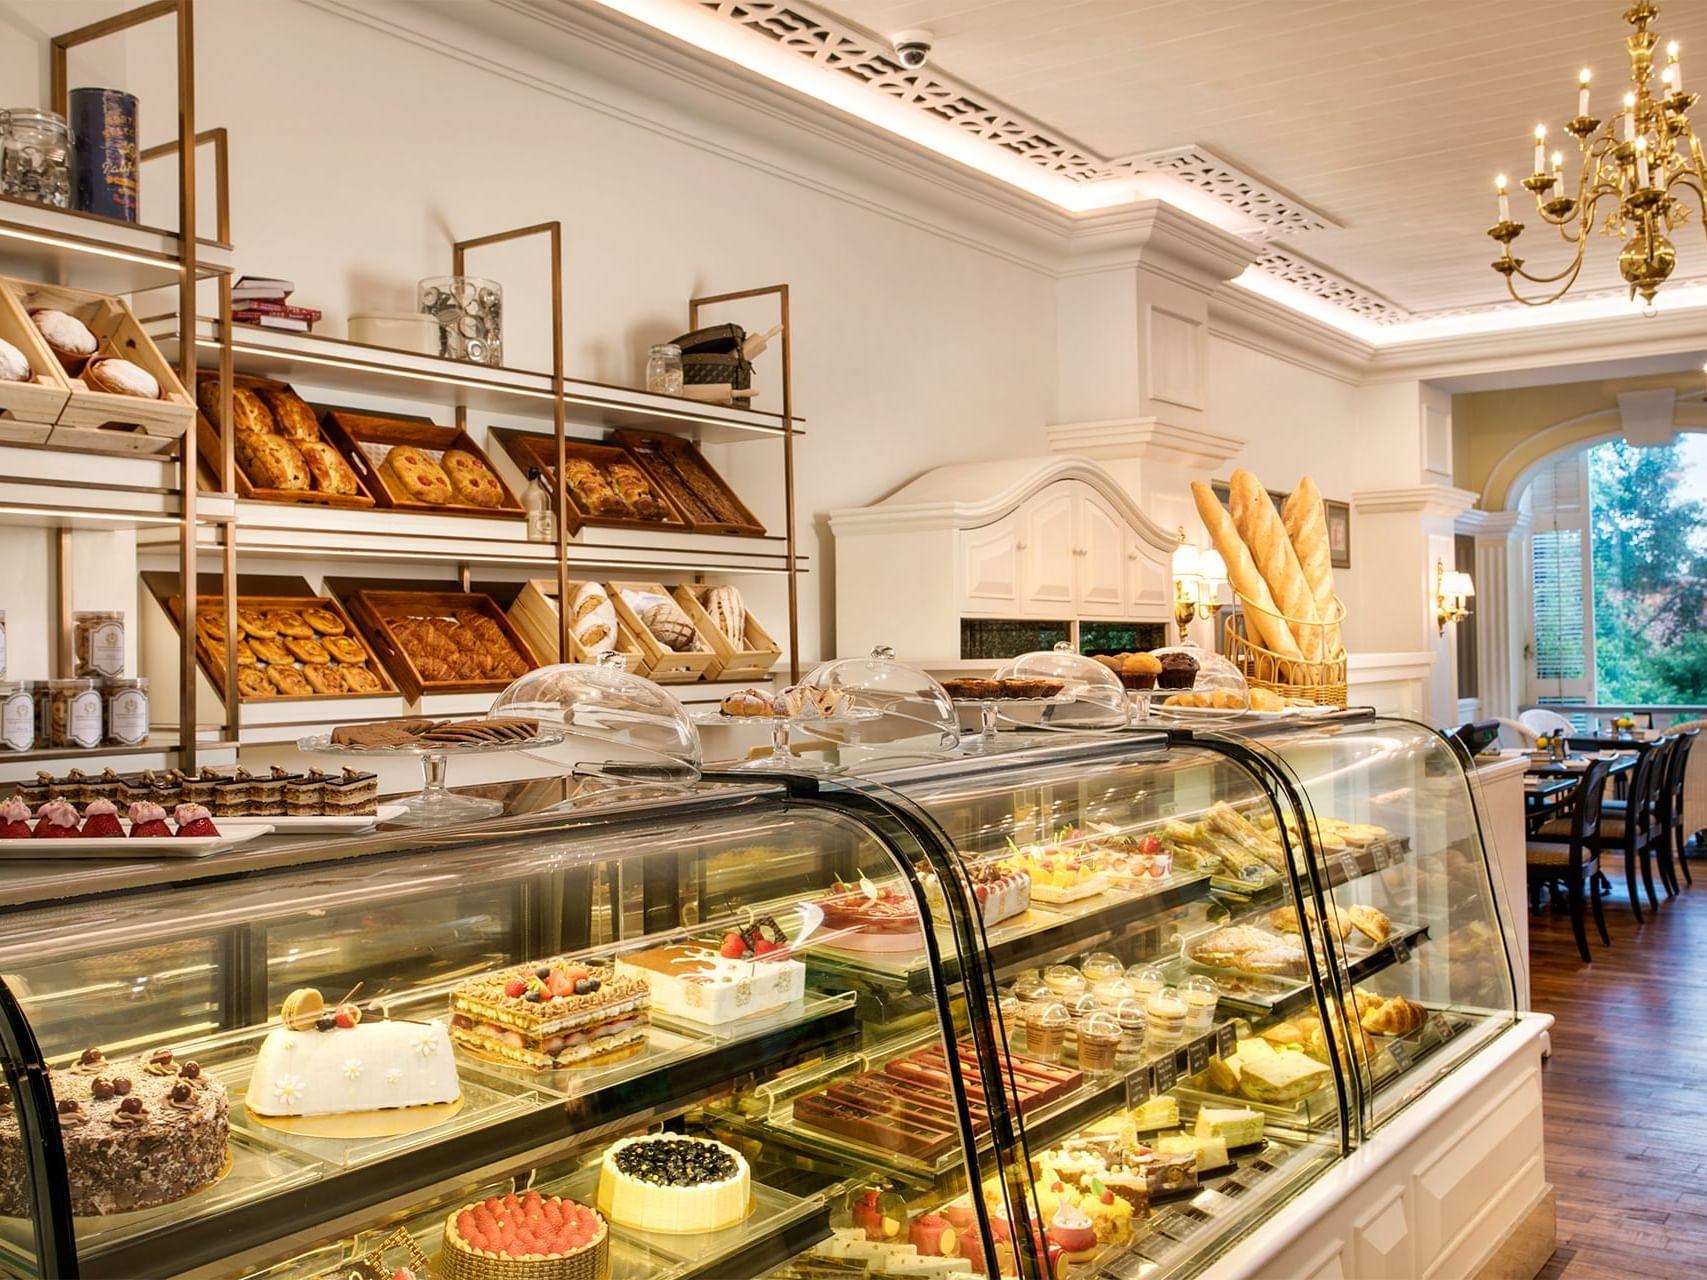 Cake shop at Artyzen Grand Lapa Hotel Macau